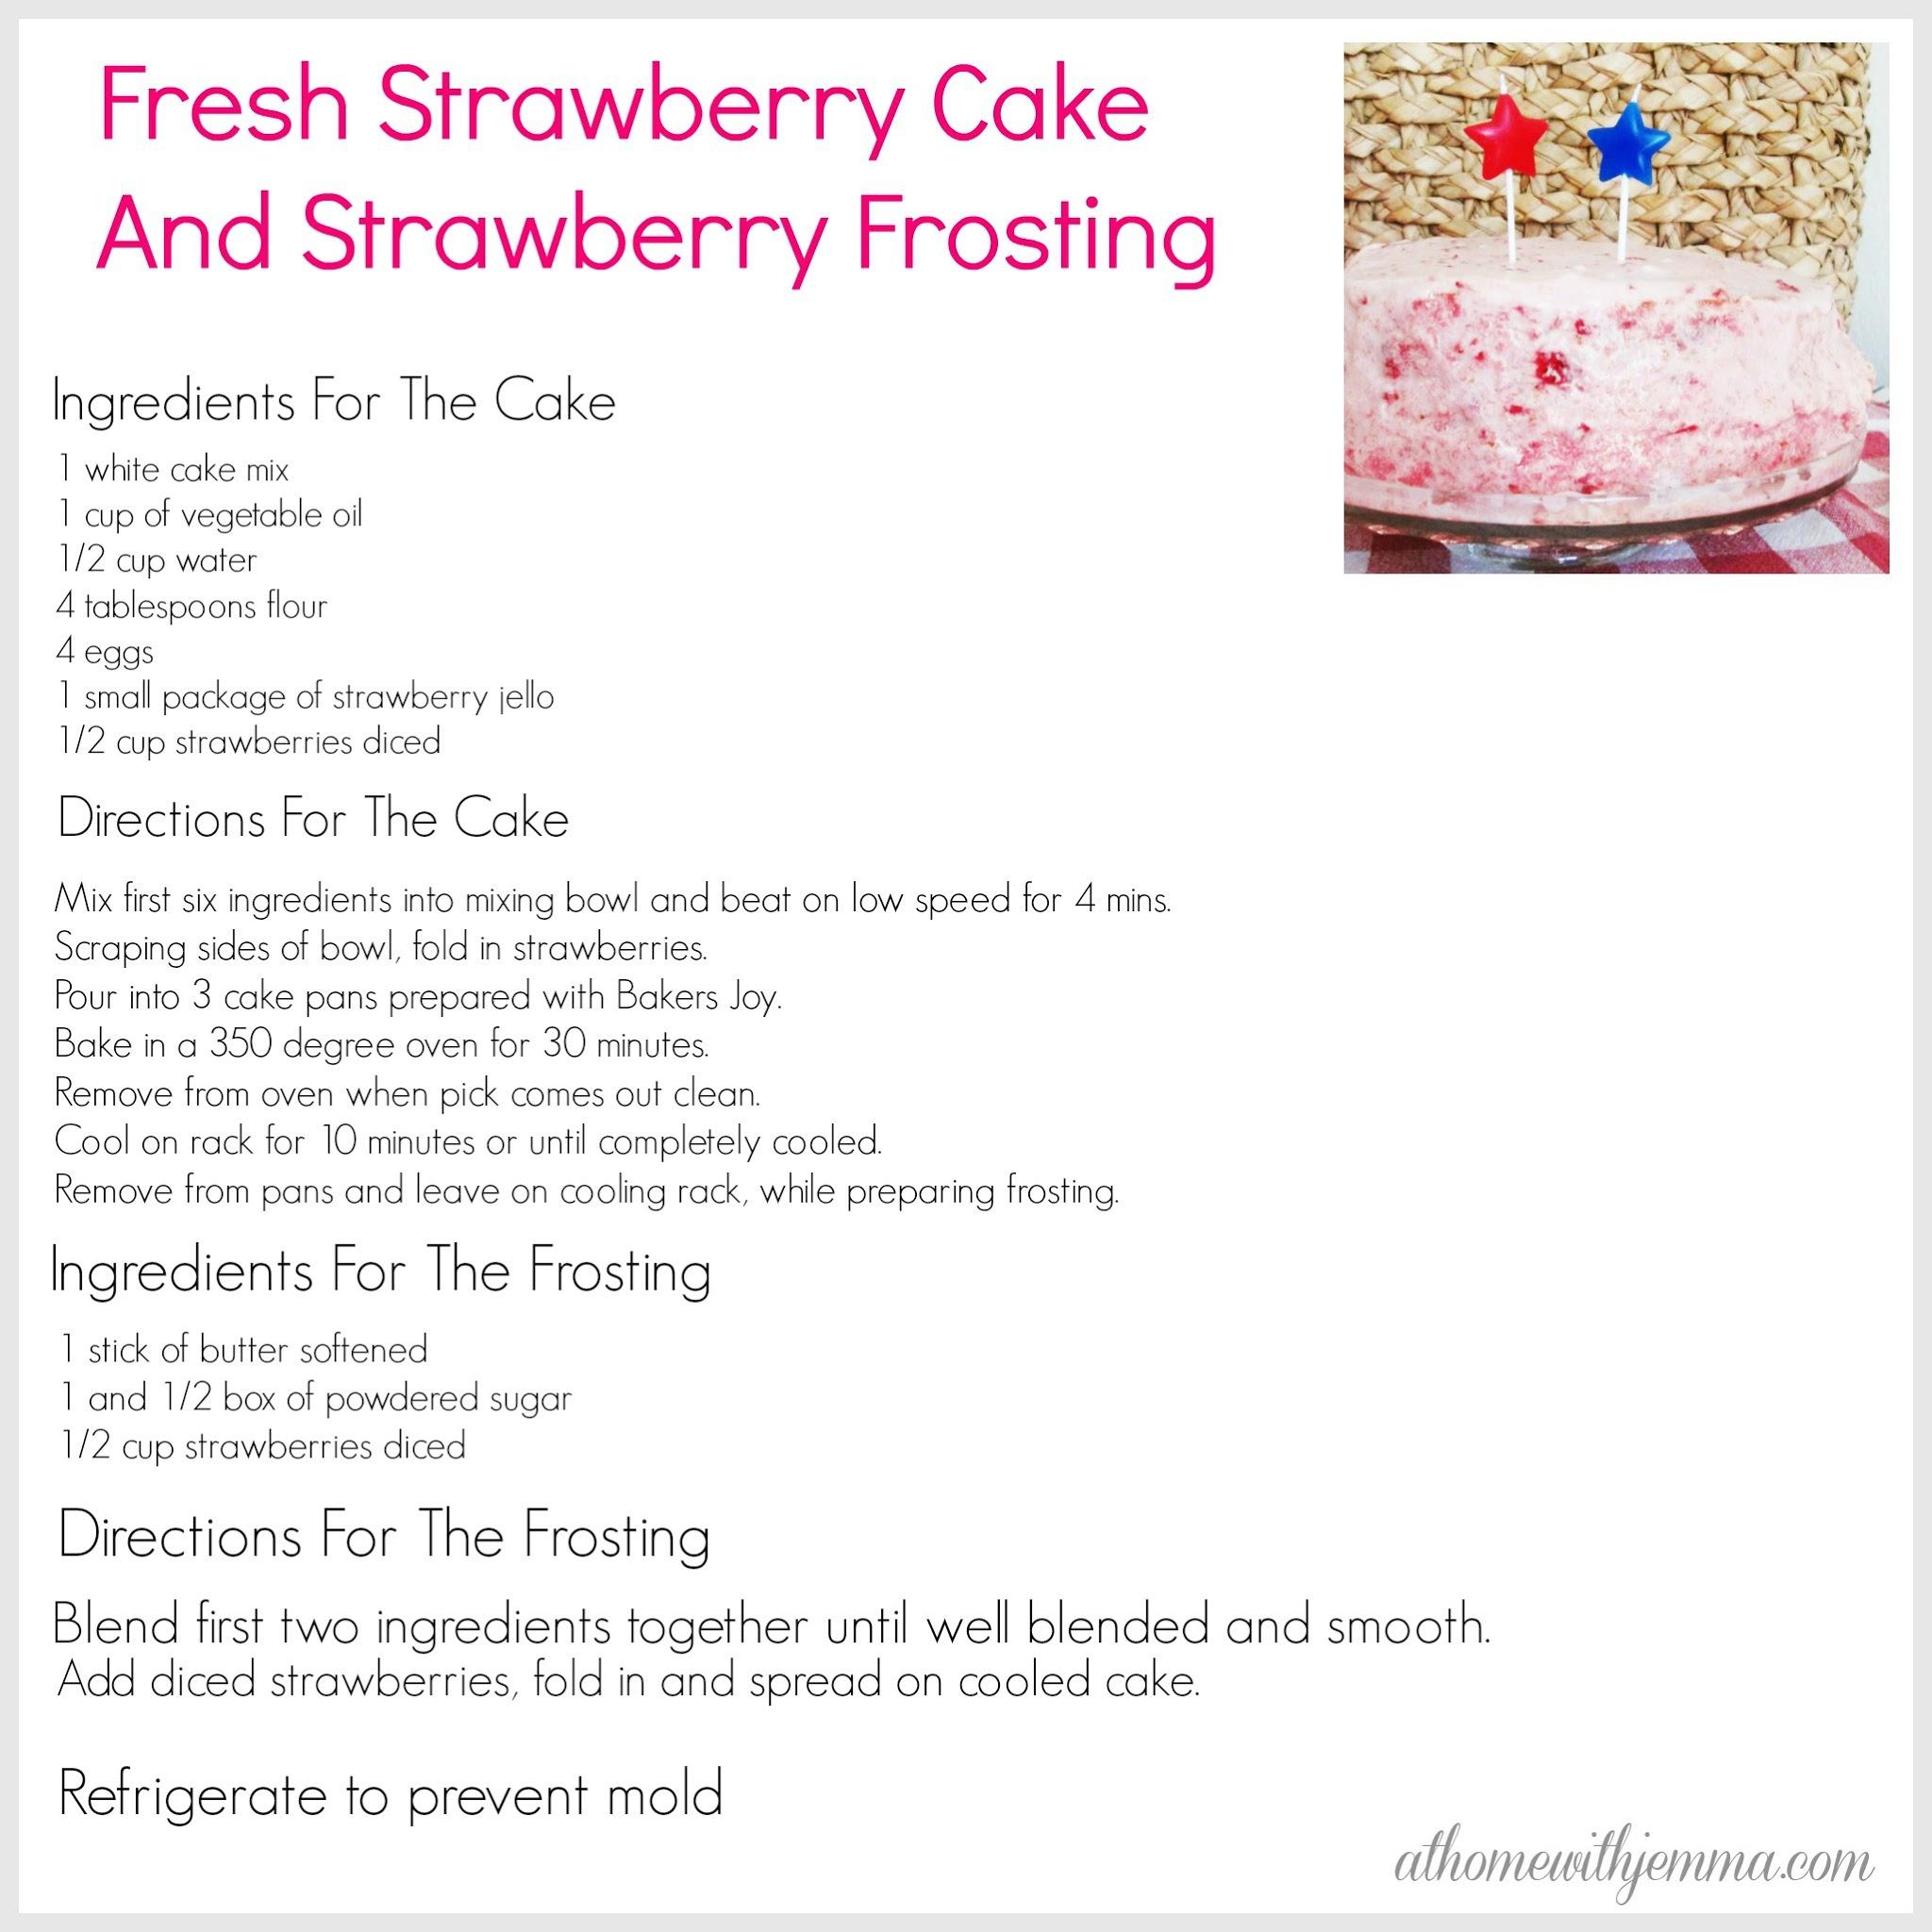 recipe-strawberry-cake-homemade-scratch-athomewithjemma